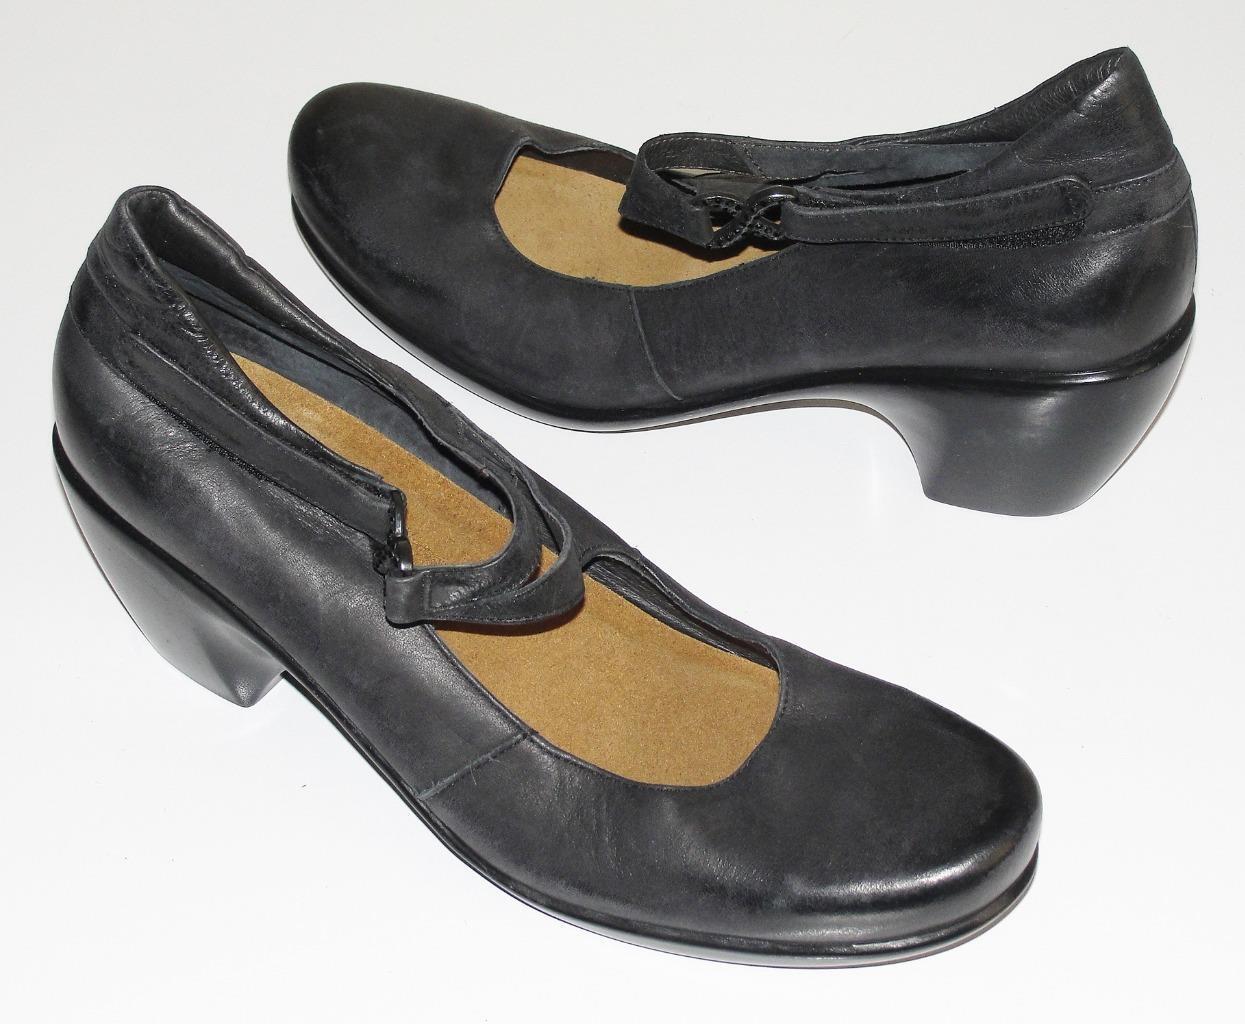 NAOTBLACKLEATHER RHINESTONE BUCKLE COMFORTMARY JANE PUMPS Schuhe HEELS41